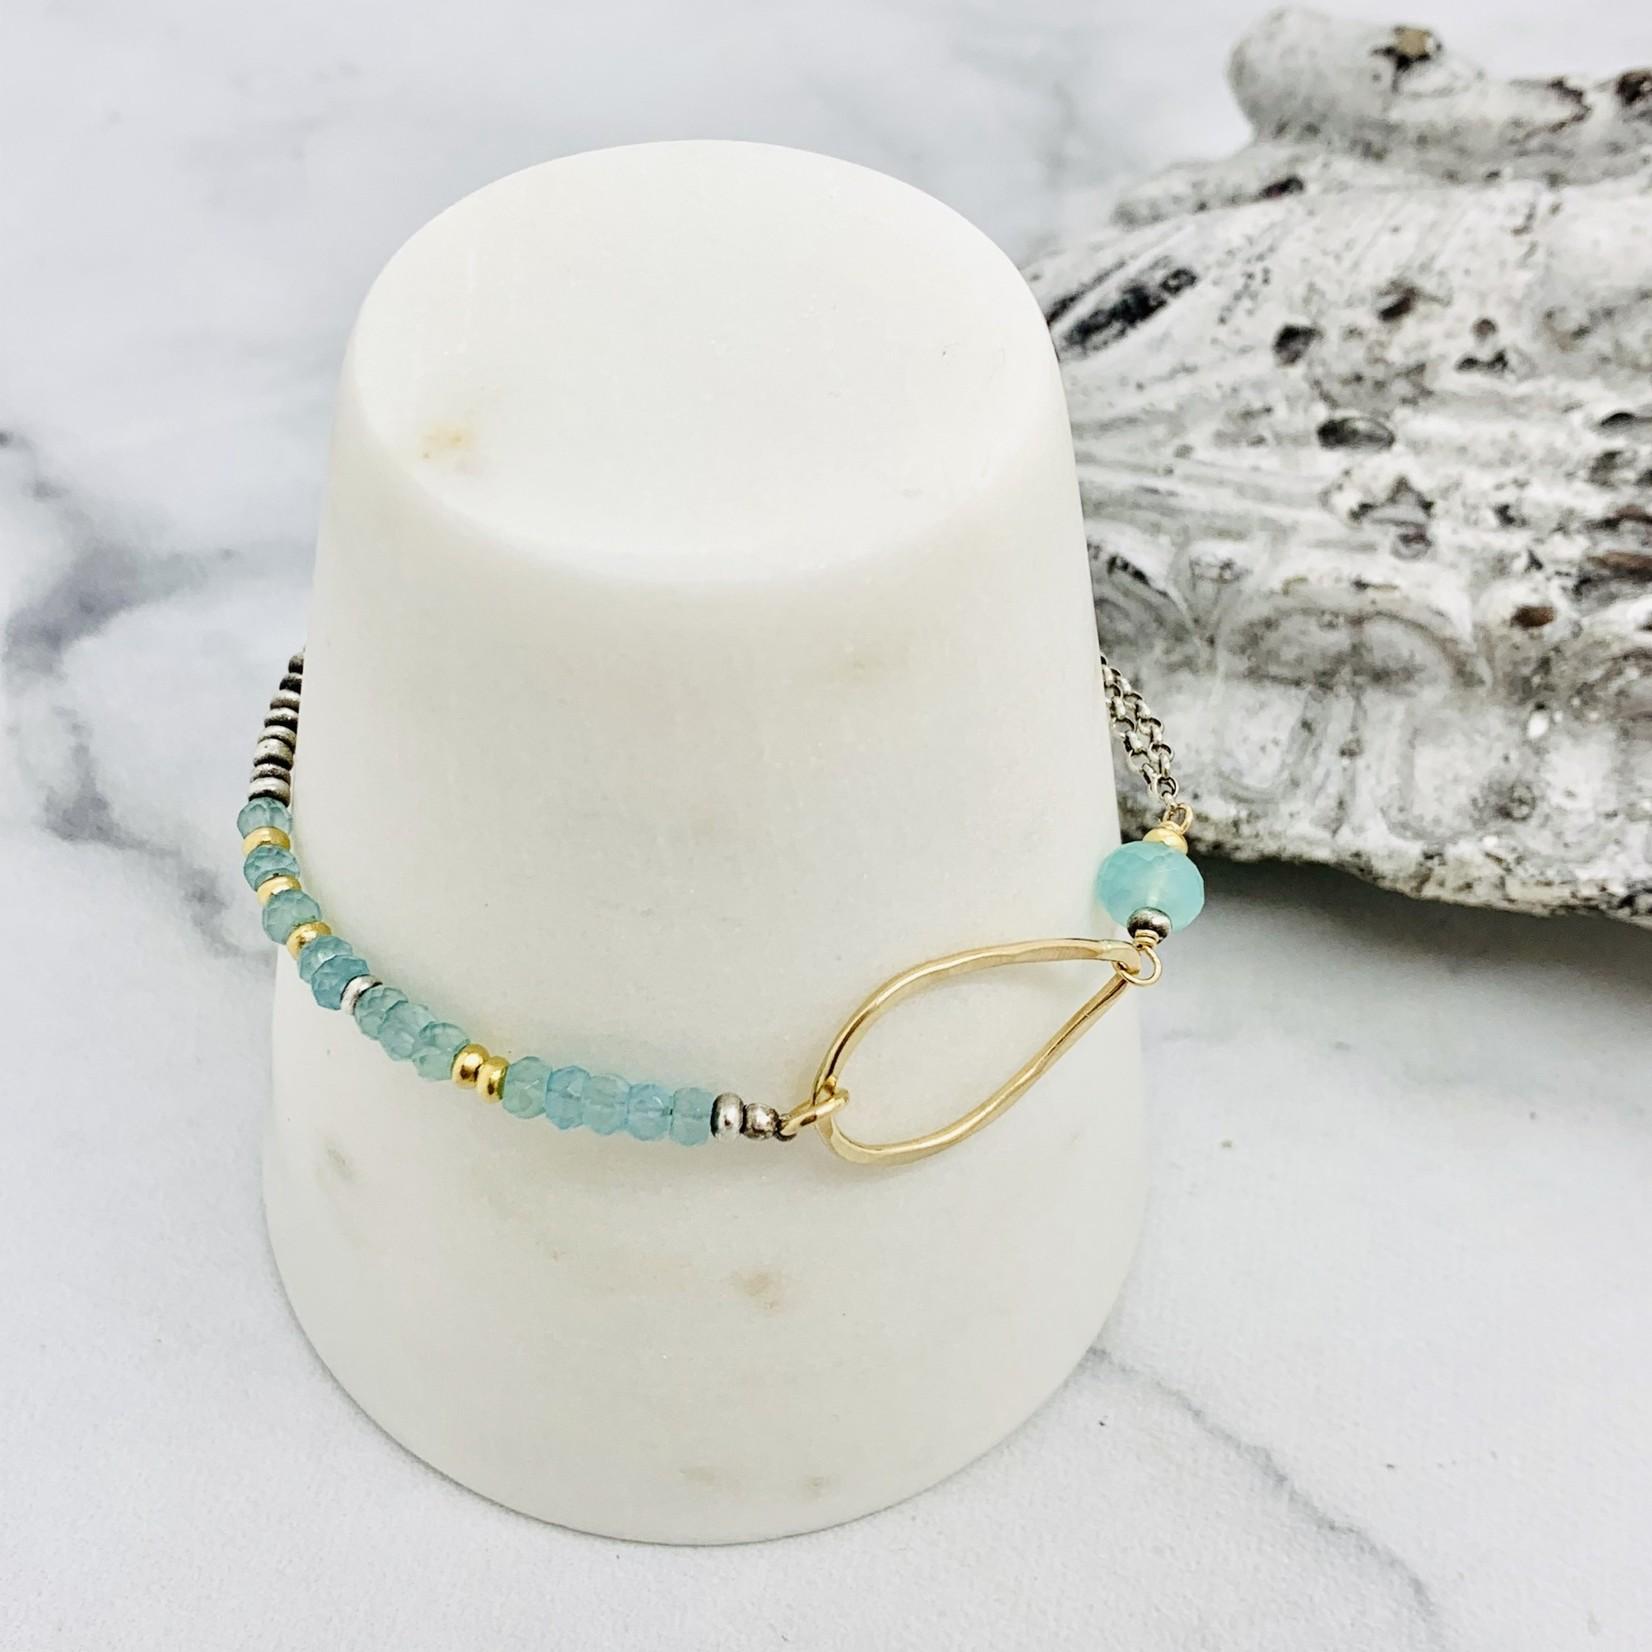 J&I Handmade bracelet with 14kt gf teardrop on aqua chalcedony and sterling chain